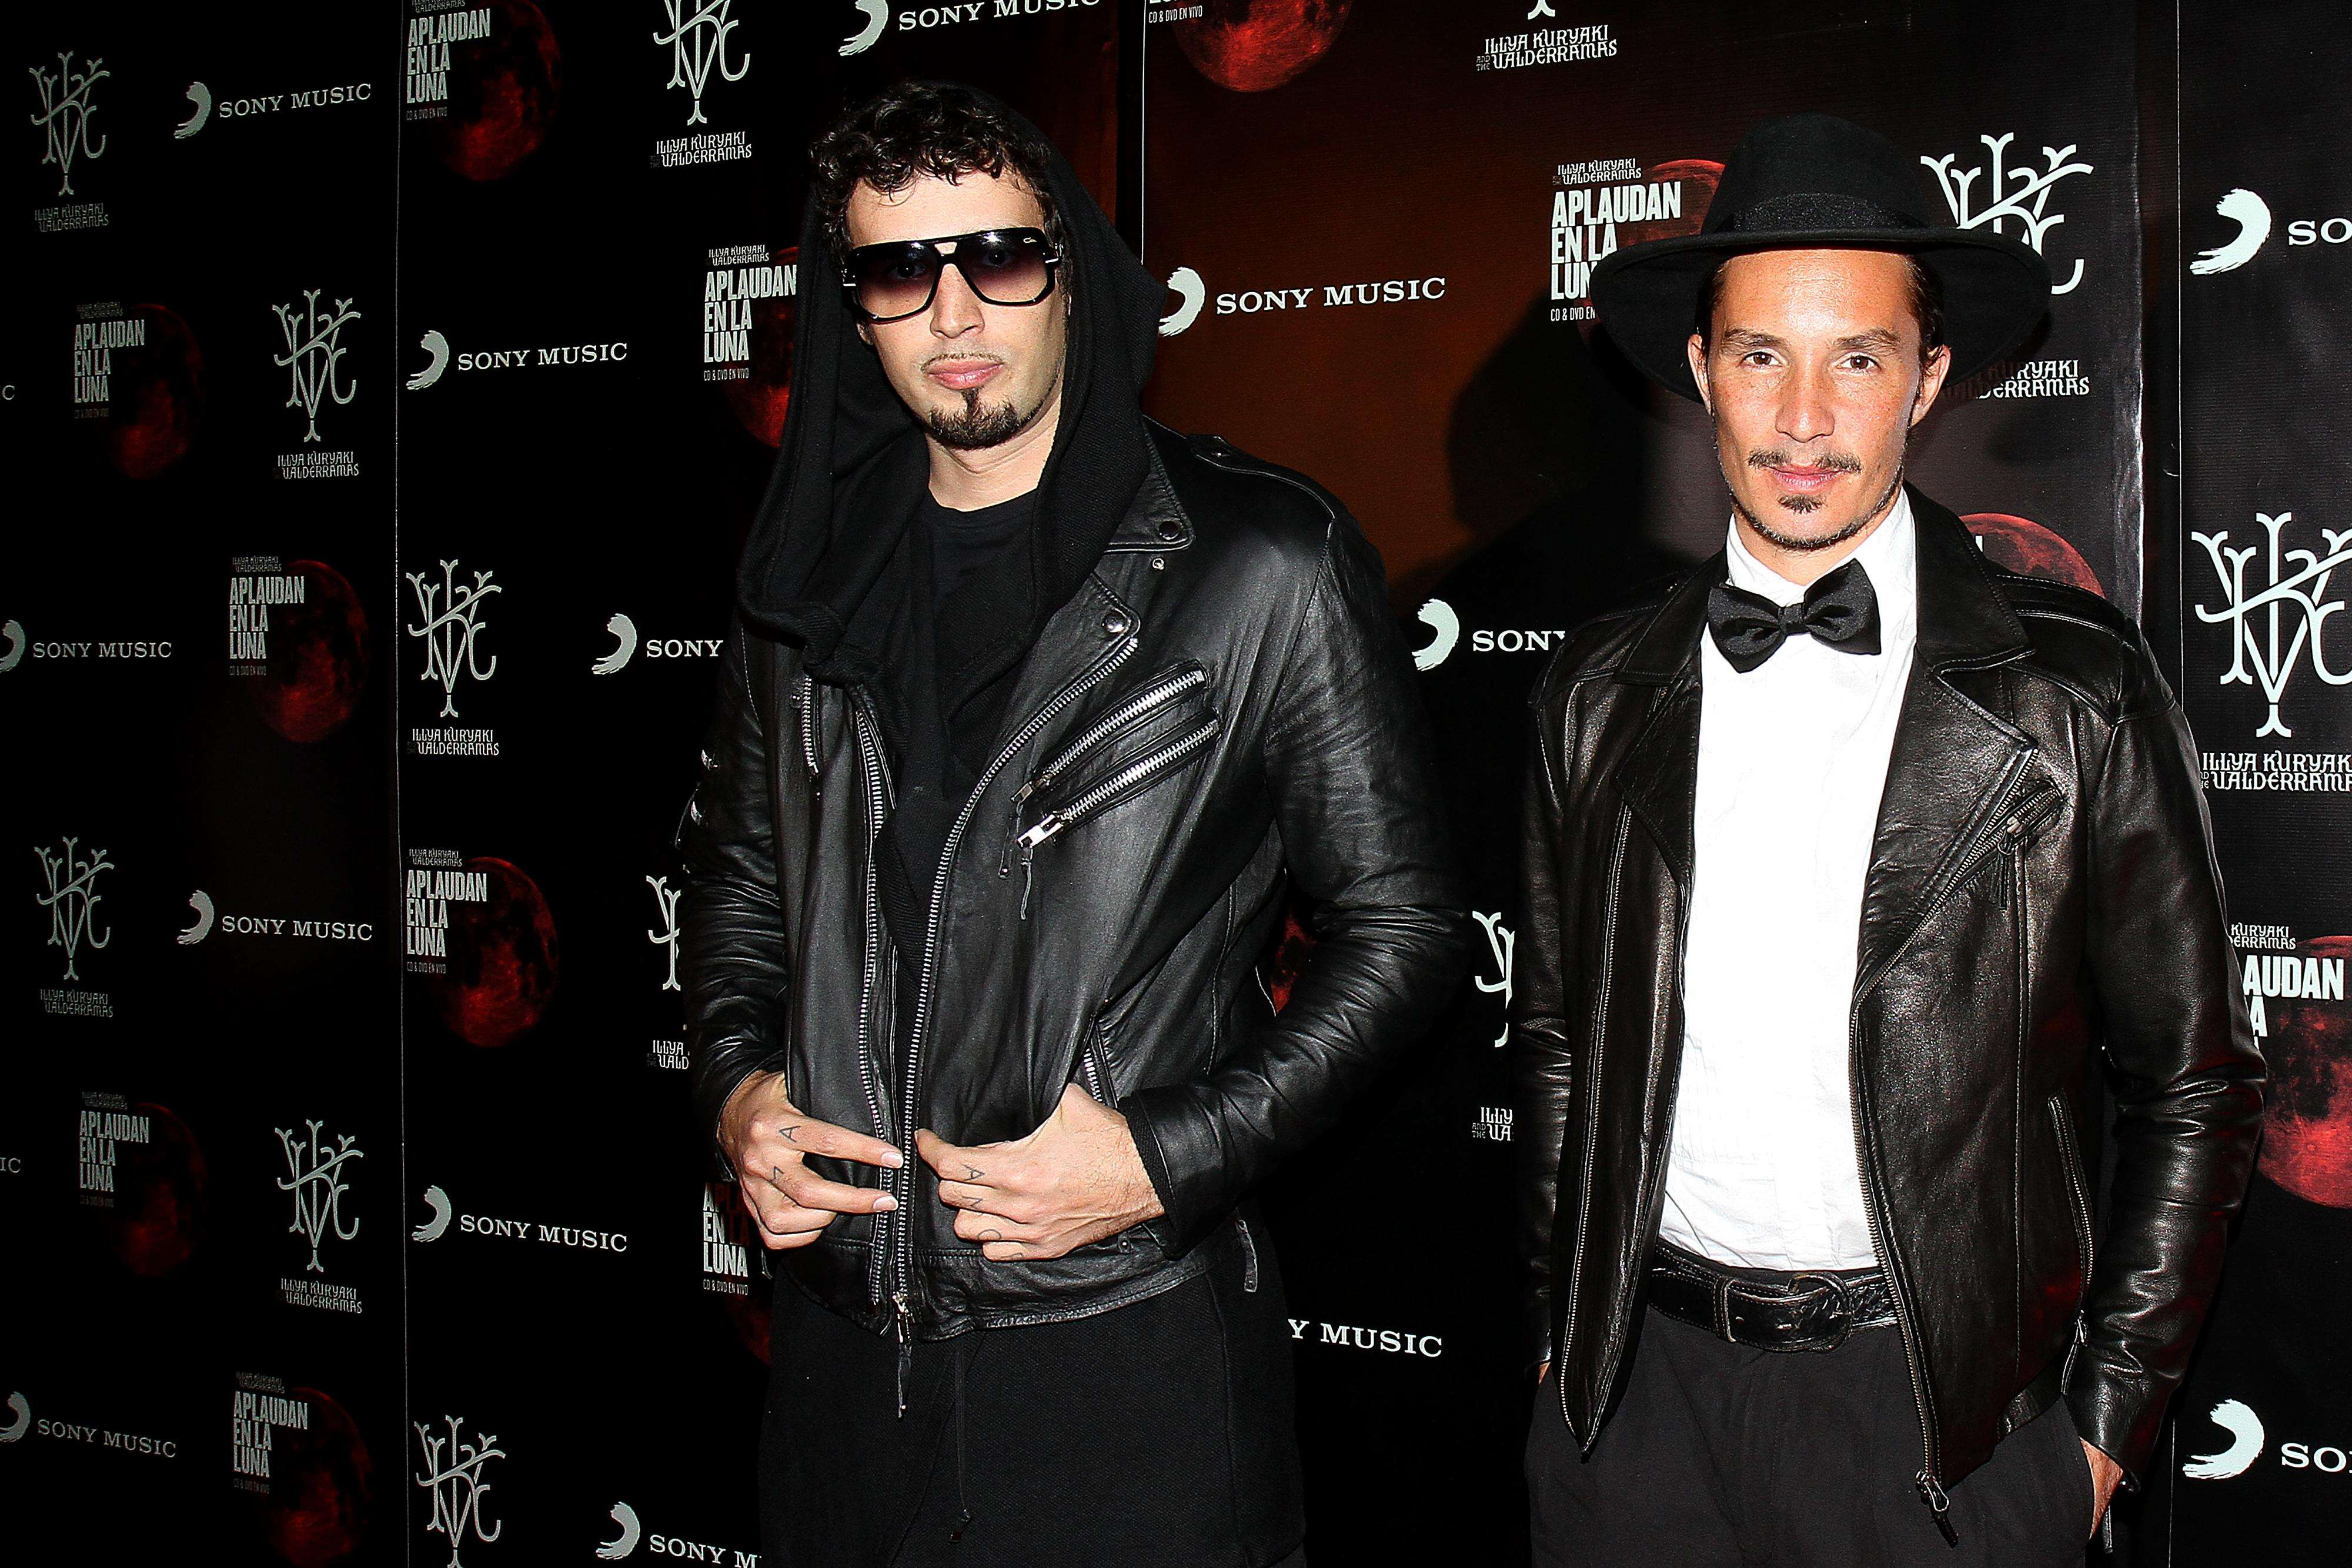 Gentileza Sony Music